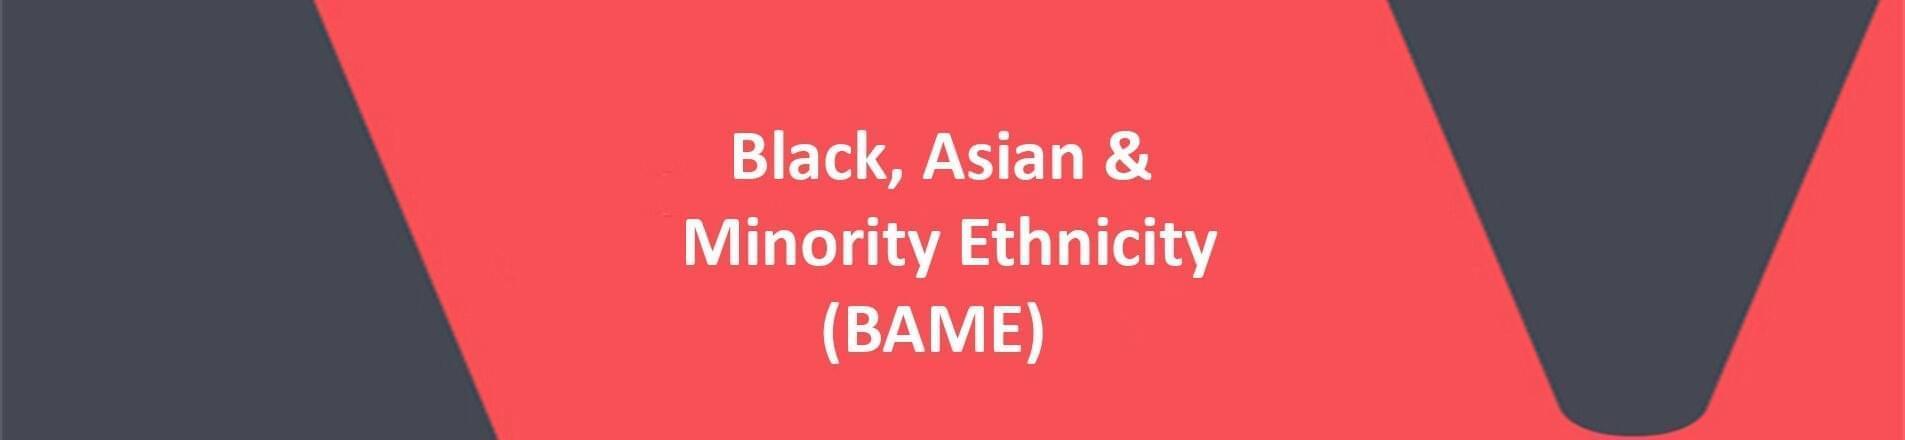 Black, Asian & Minority Ethnicity (BAME) on red VERCIDA background